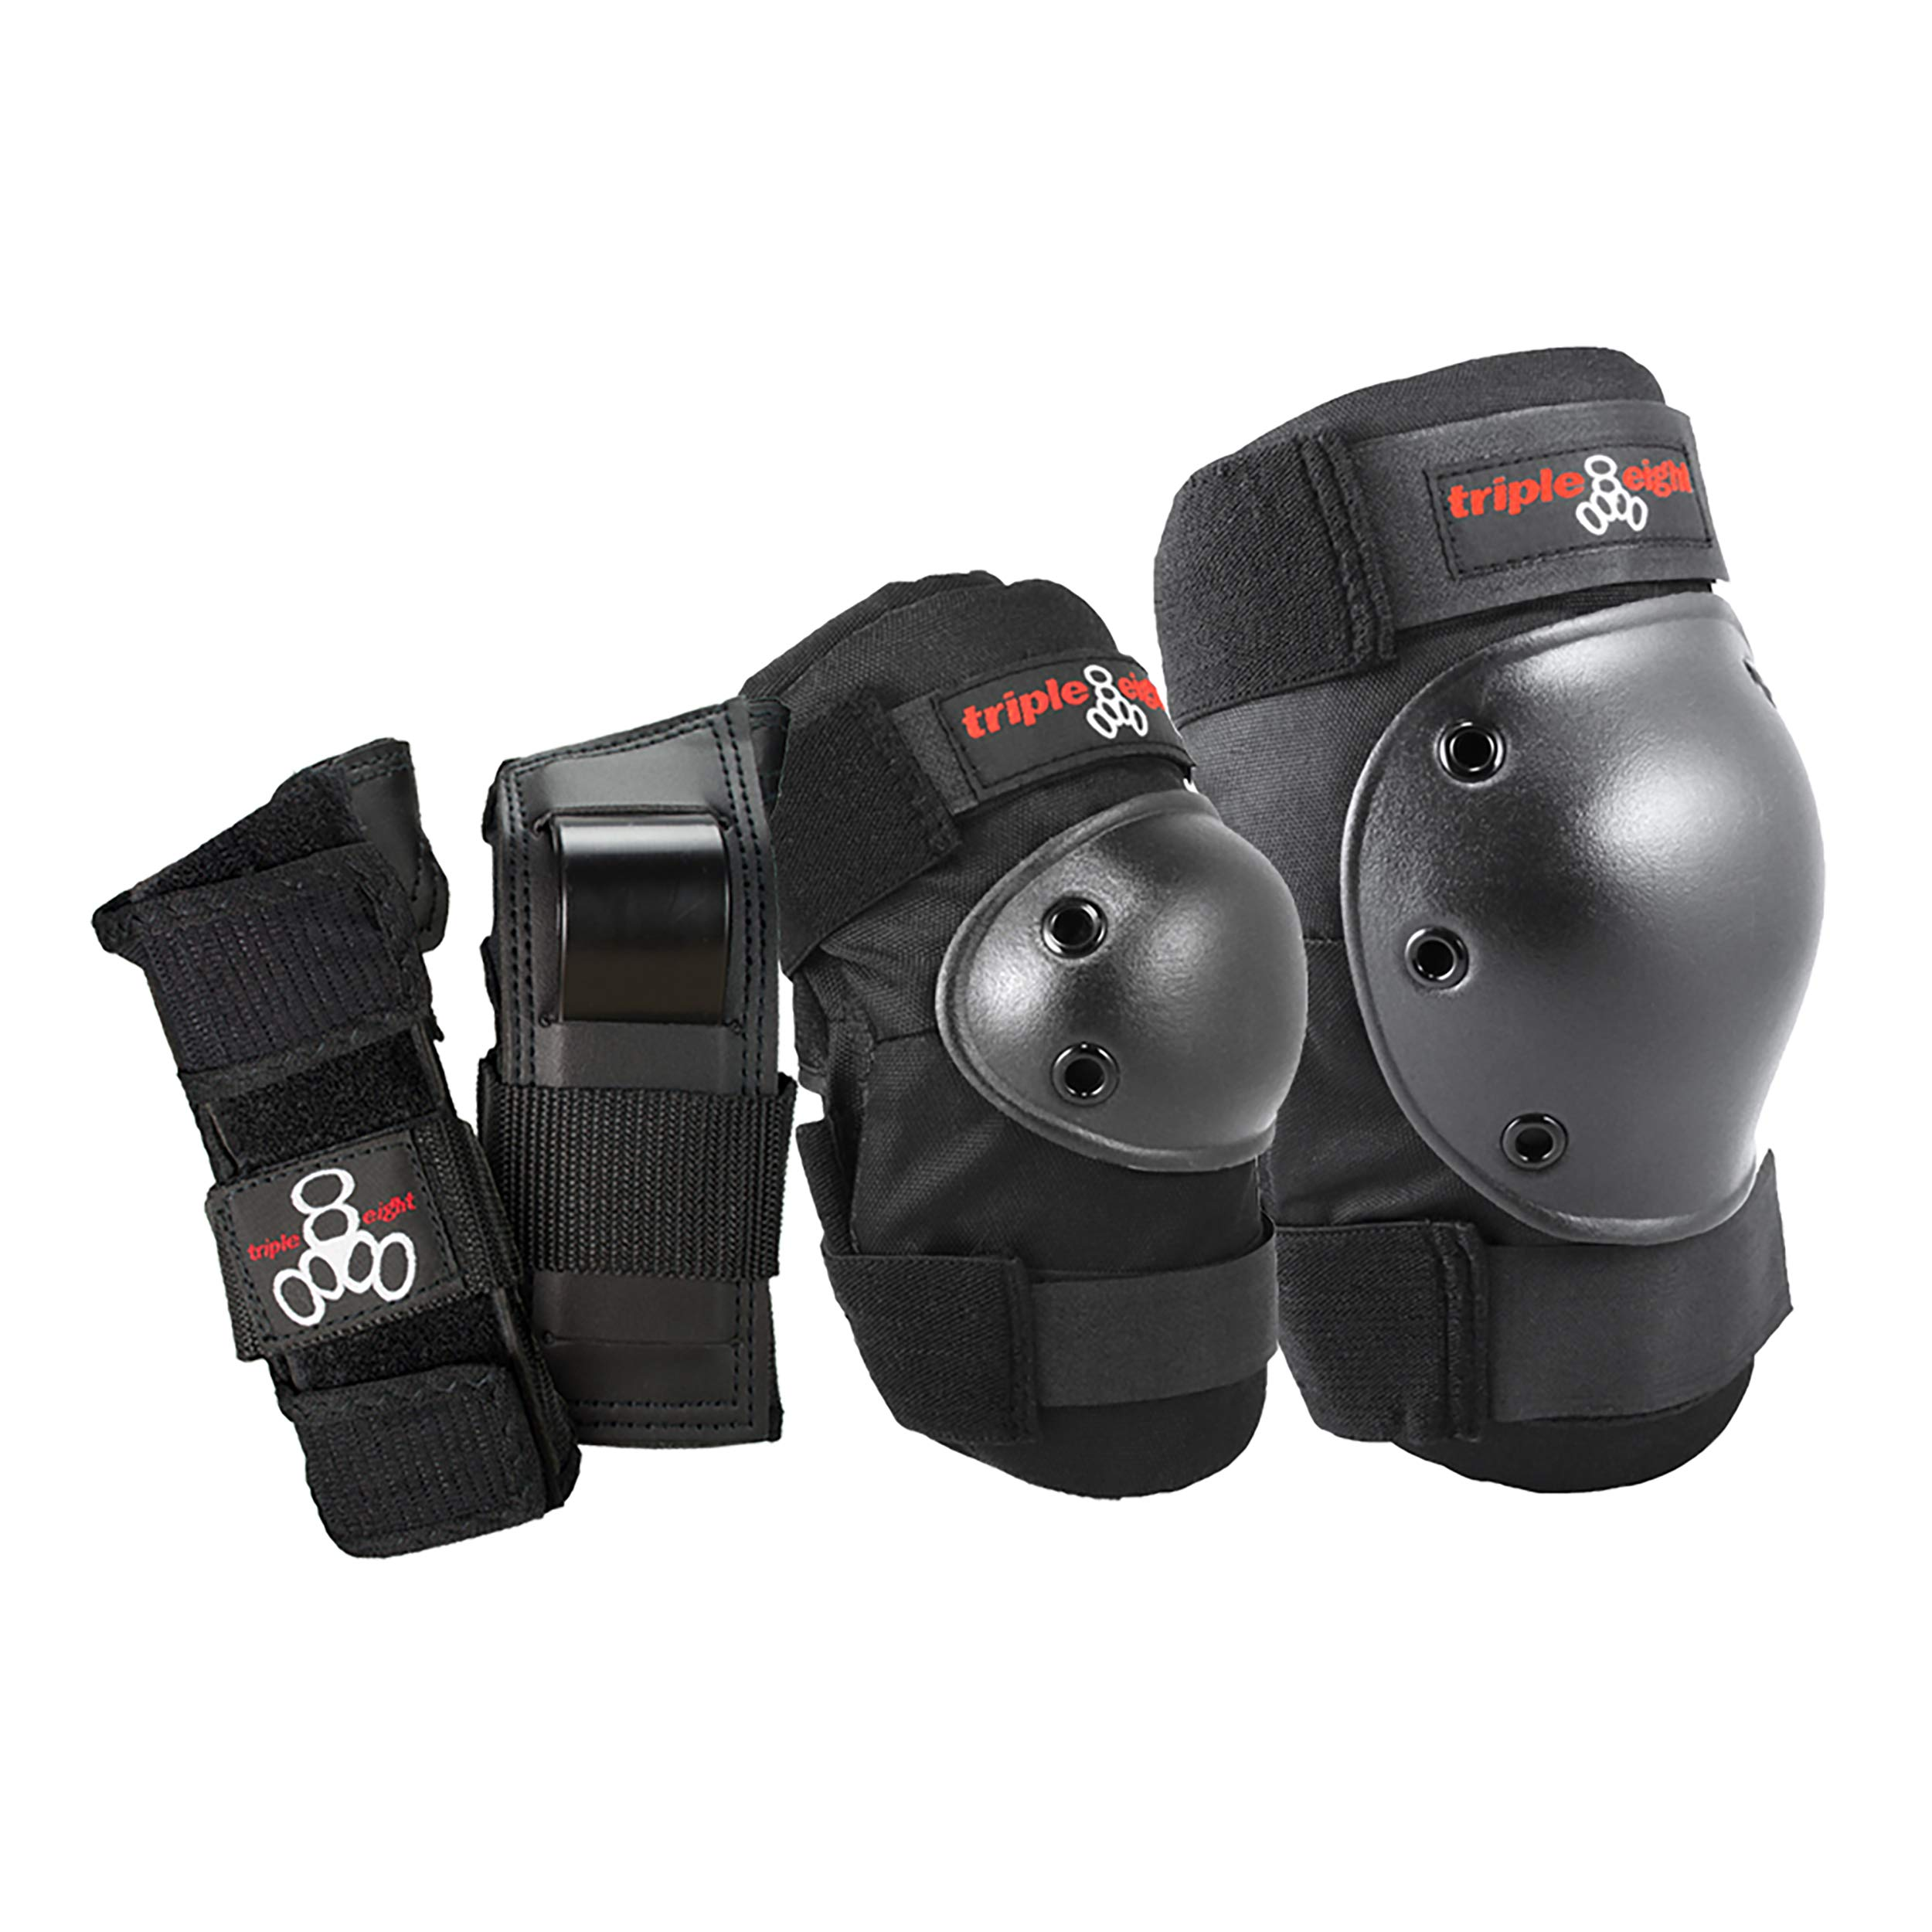 Triple 8 Saver Series Wristsavers/Kneesavers/Elbowsavers (Black, Large, 3 Pack)